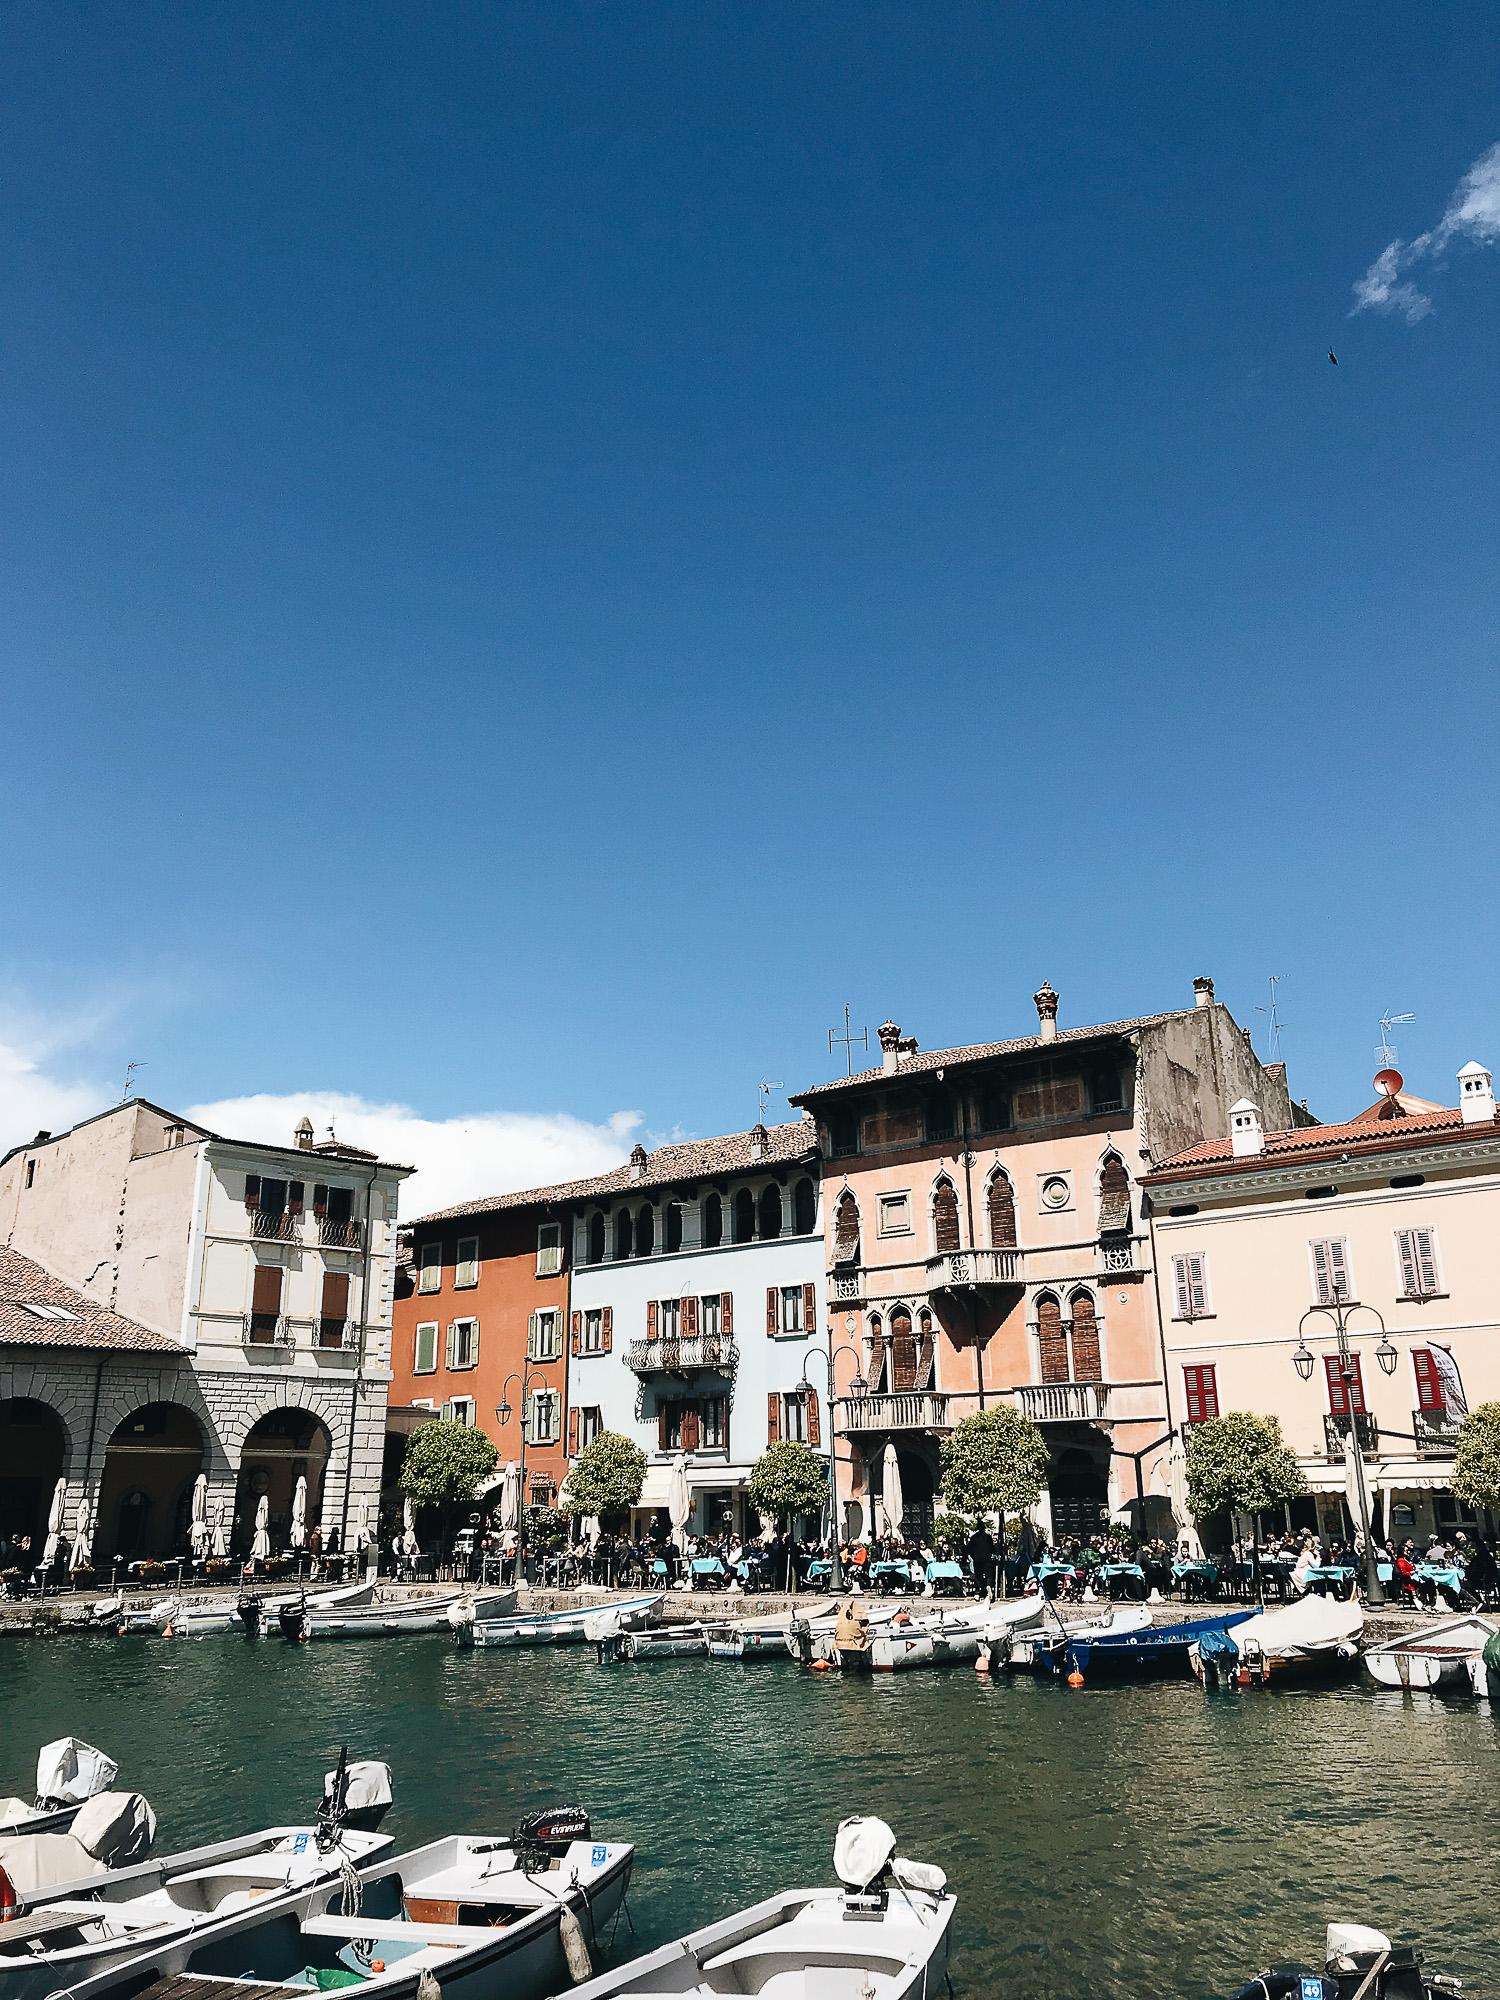 OurBeautifulAdventure-LakeGarda-Italy-Blog-6377.jpg